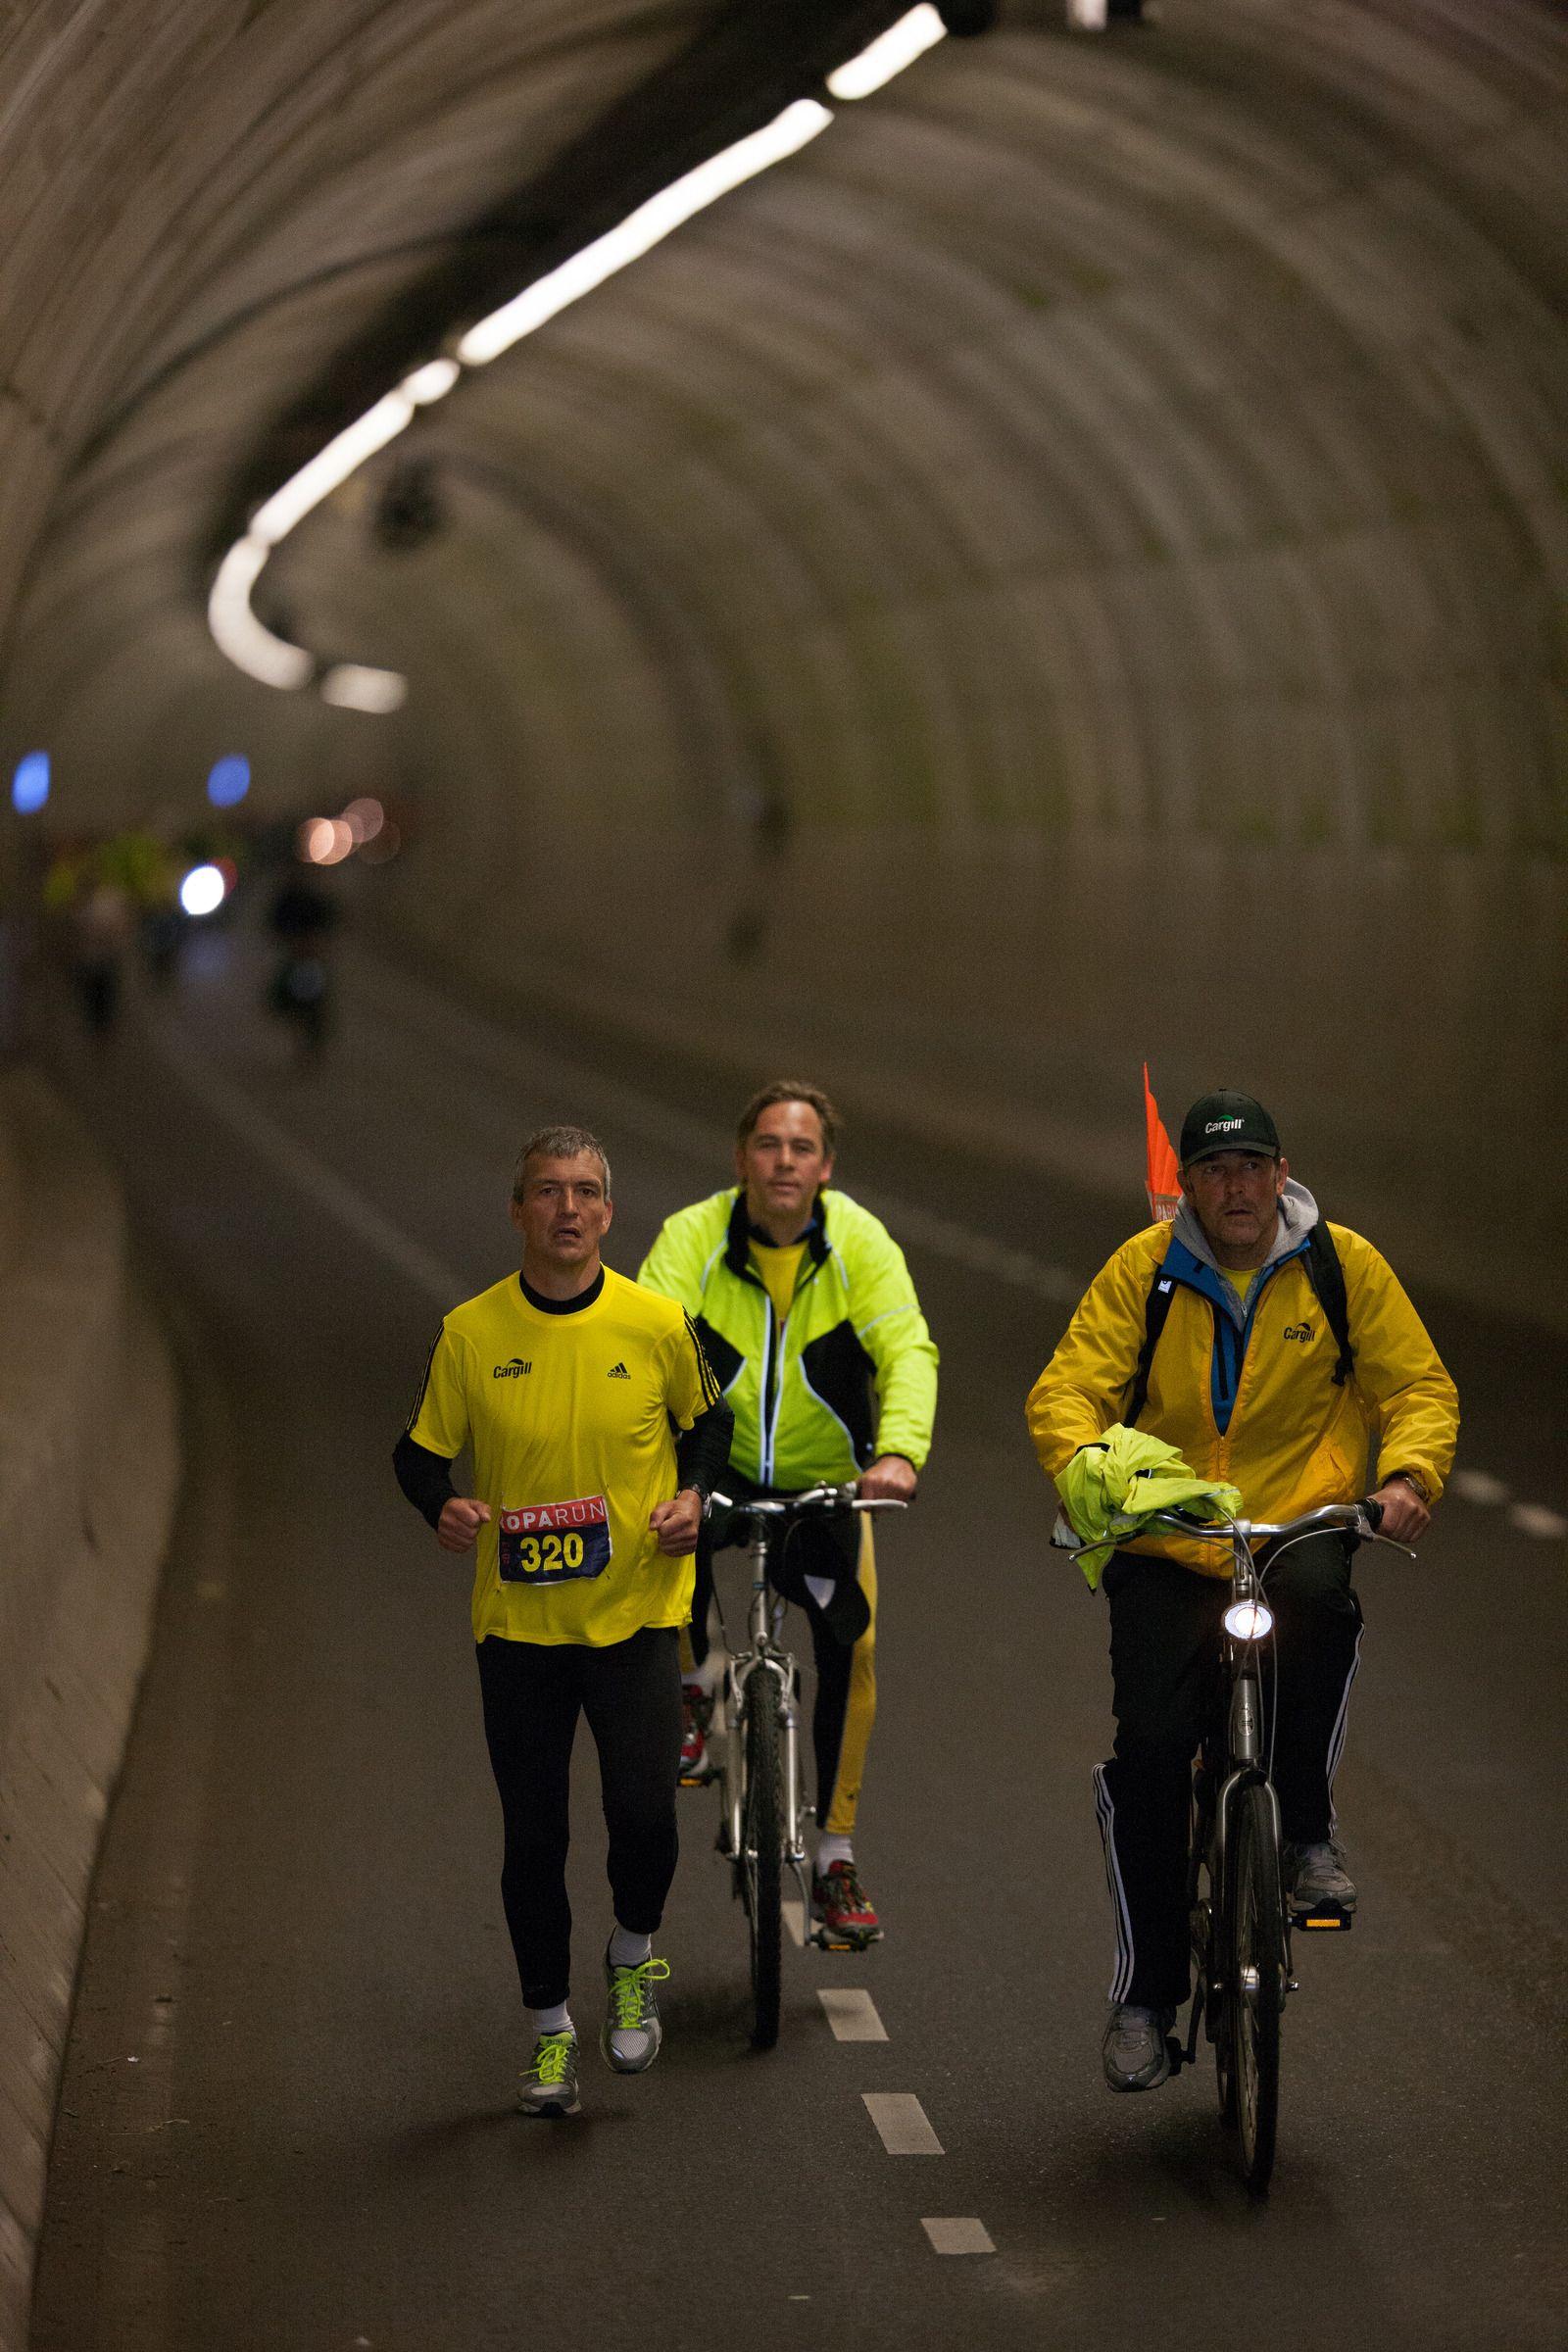 Team 320 CARGILL COCOA & CHOCOLATE RUNNERS - uit België